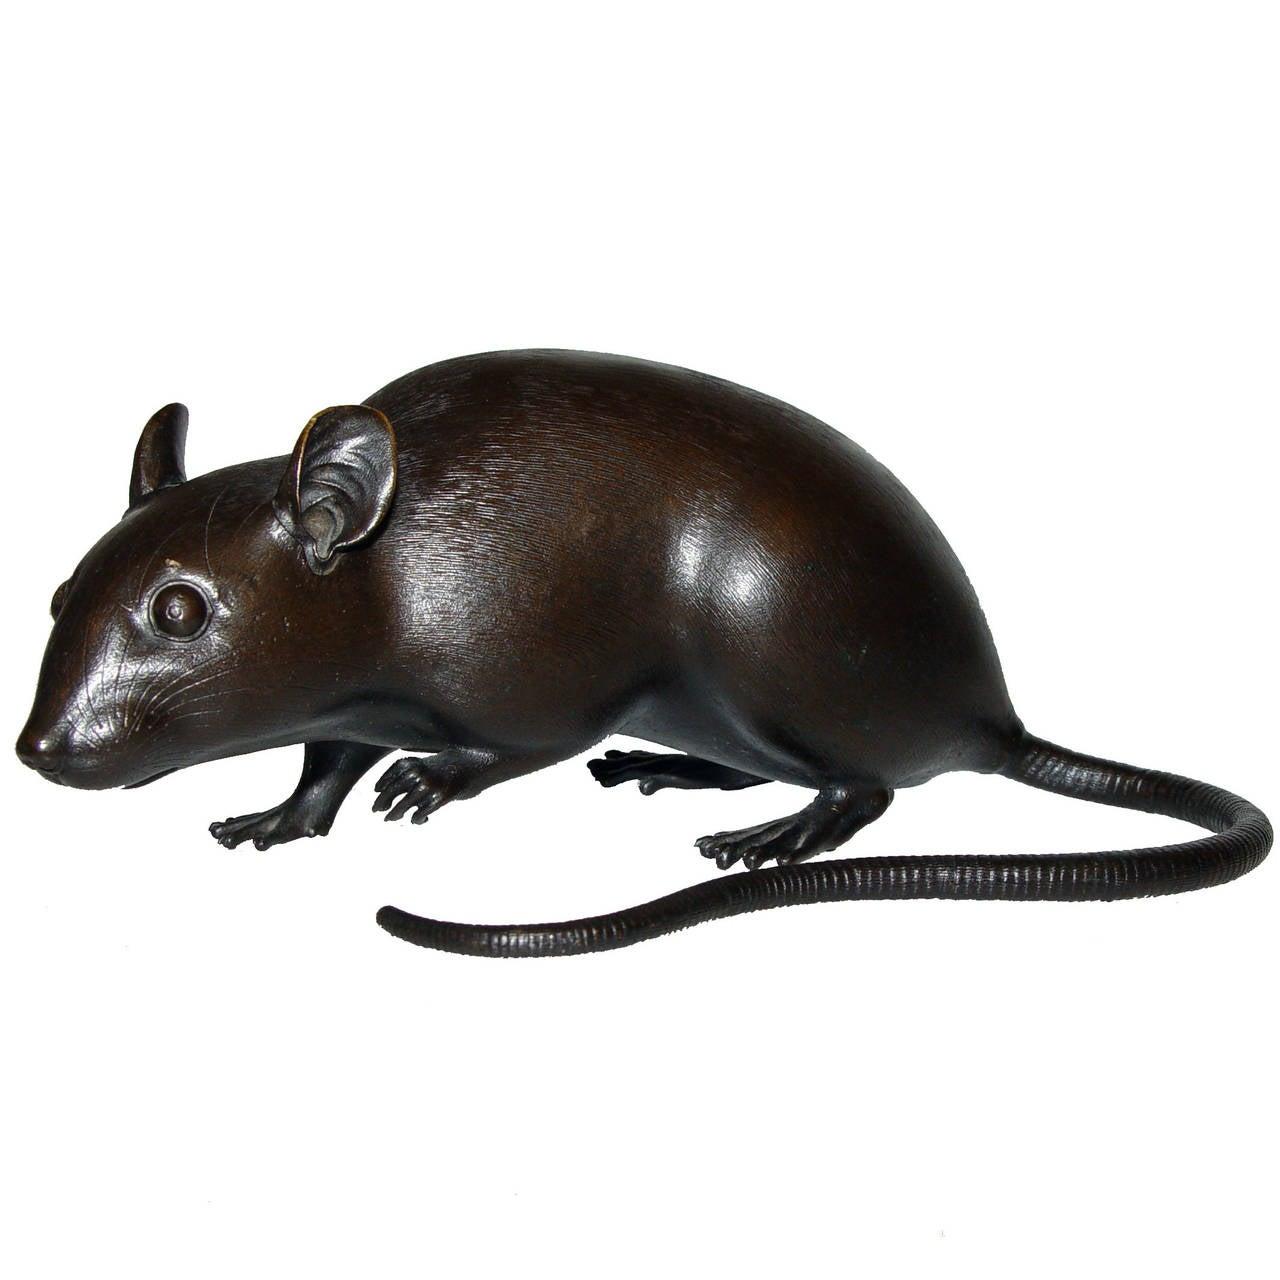 19th Century Japanese Bronze Rat Sculpture At 1stdibs